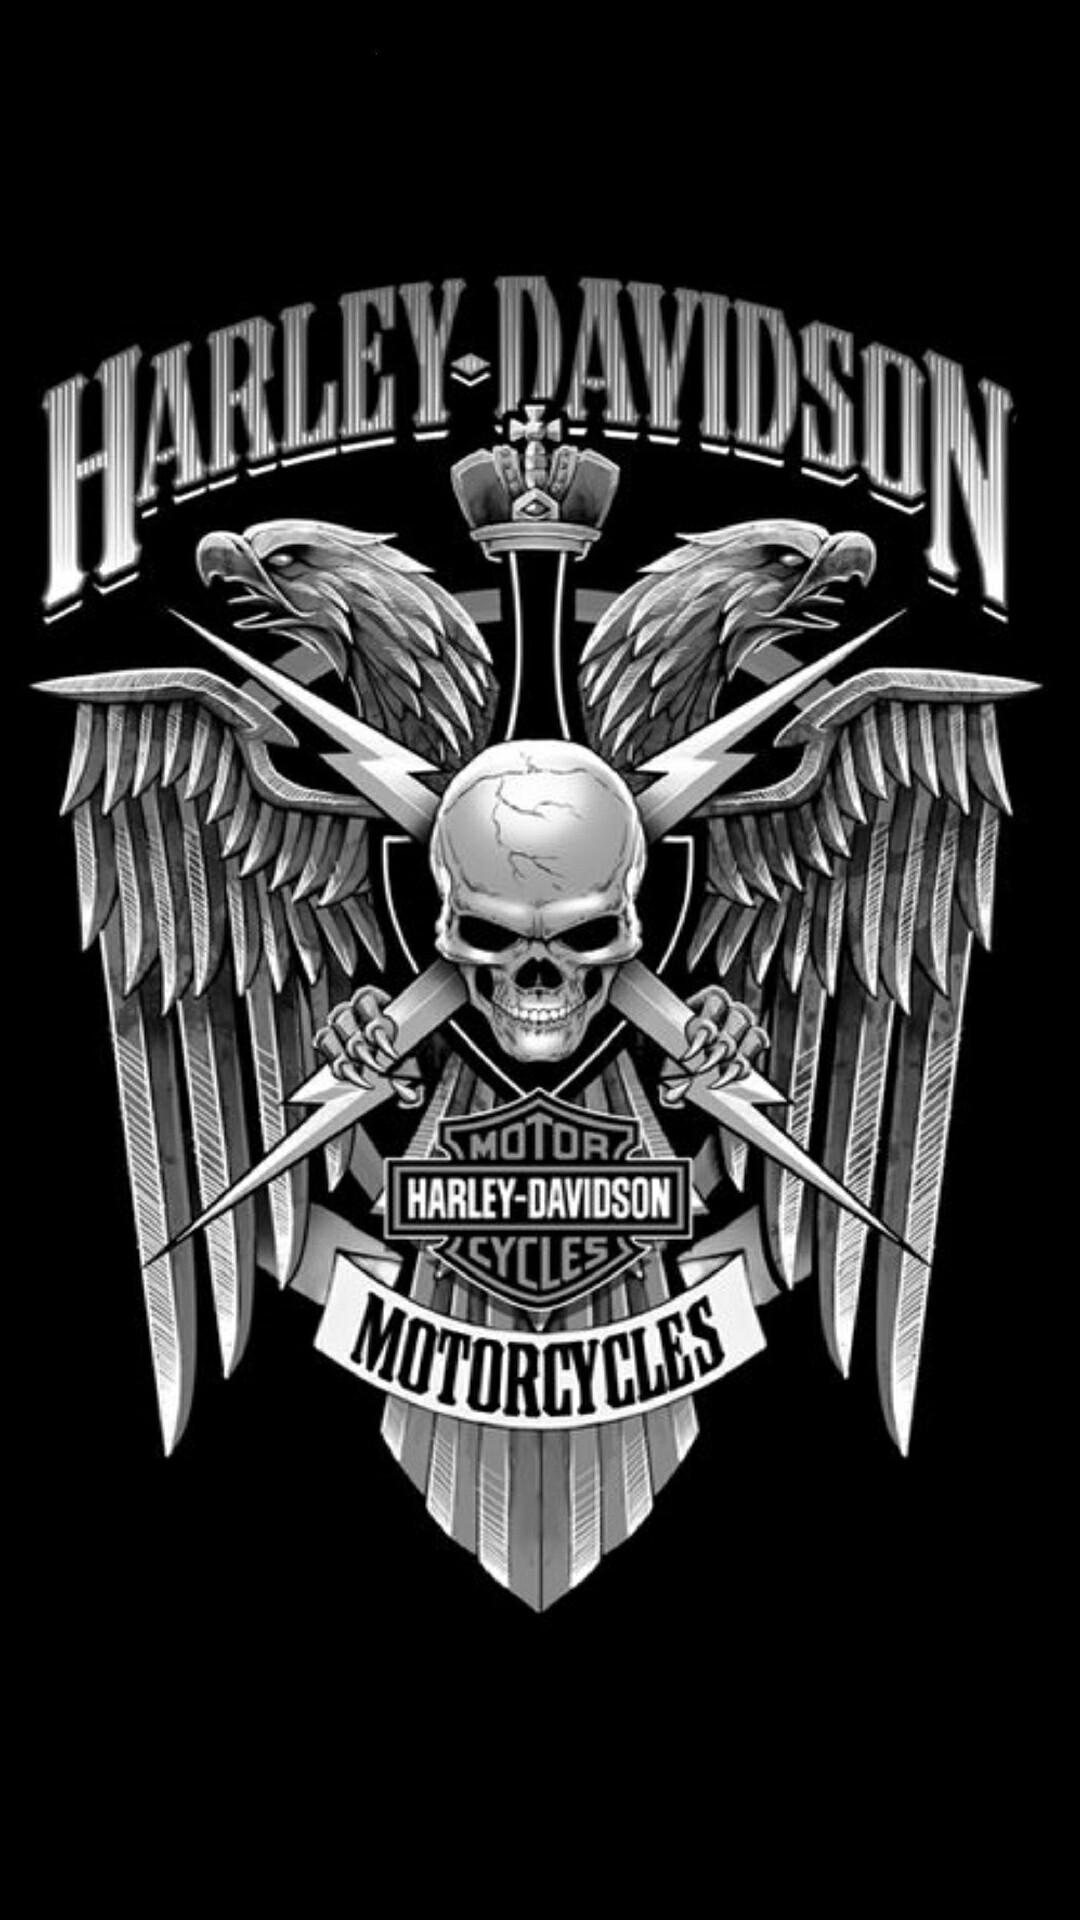 Harley Davidson Logo Black And White Free harley davidson logos how to draw  harley-davidson logo .